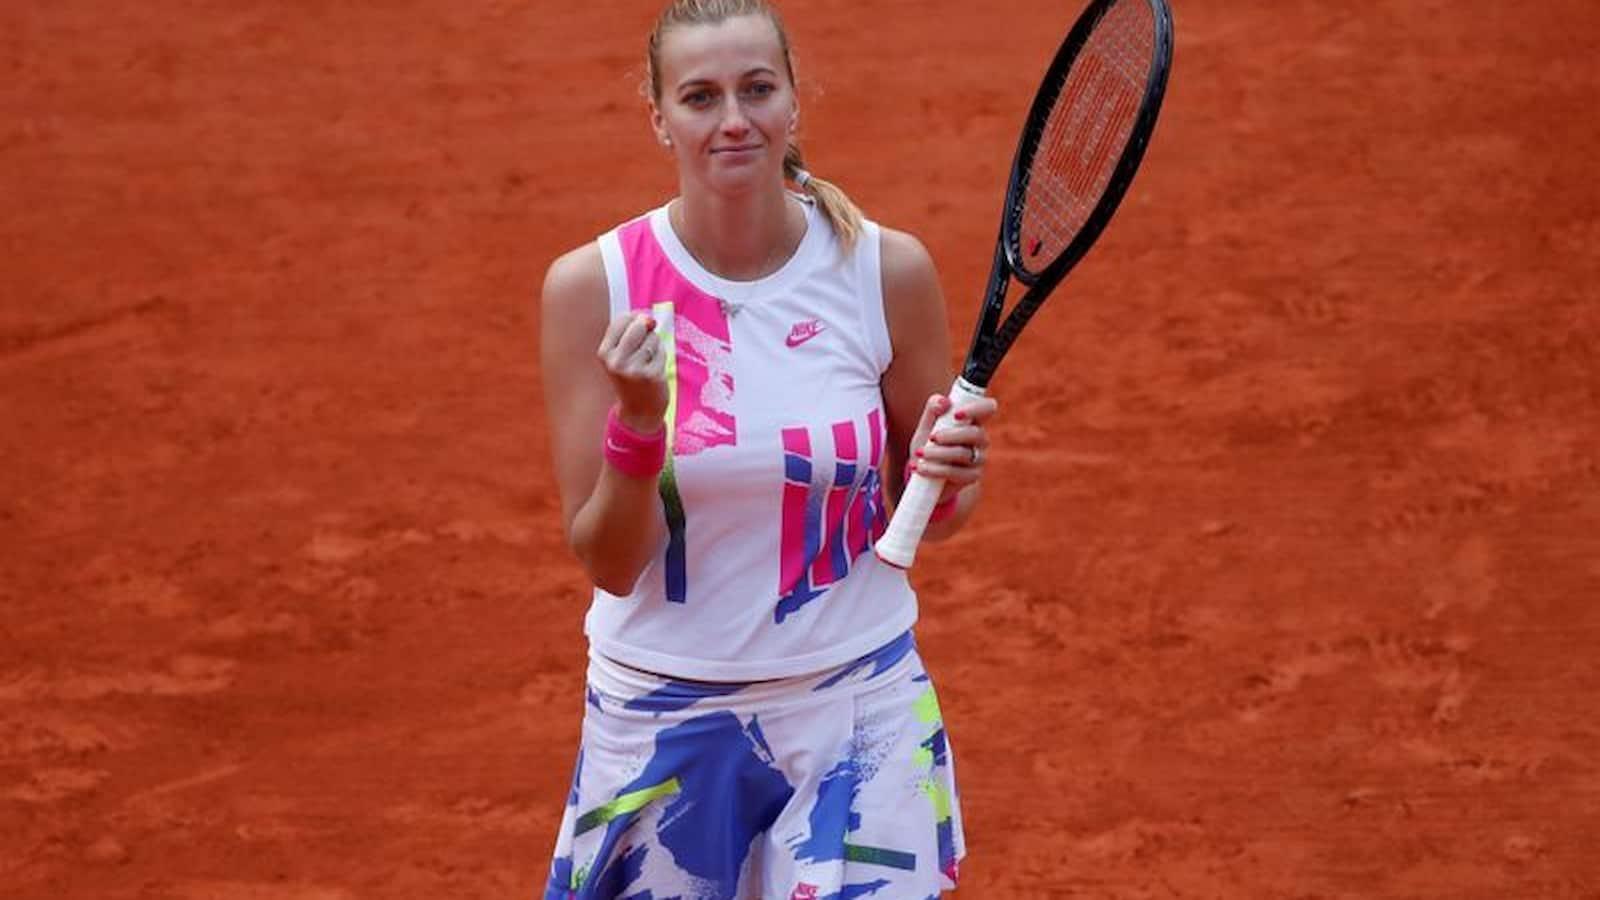 Petra Kvitova will be the favourite in the upcoming Petra Kvitova vs Magda Linette clash at the Italian Open 2021.